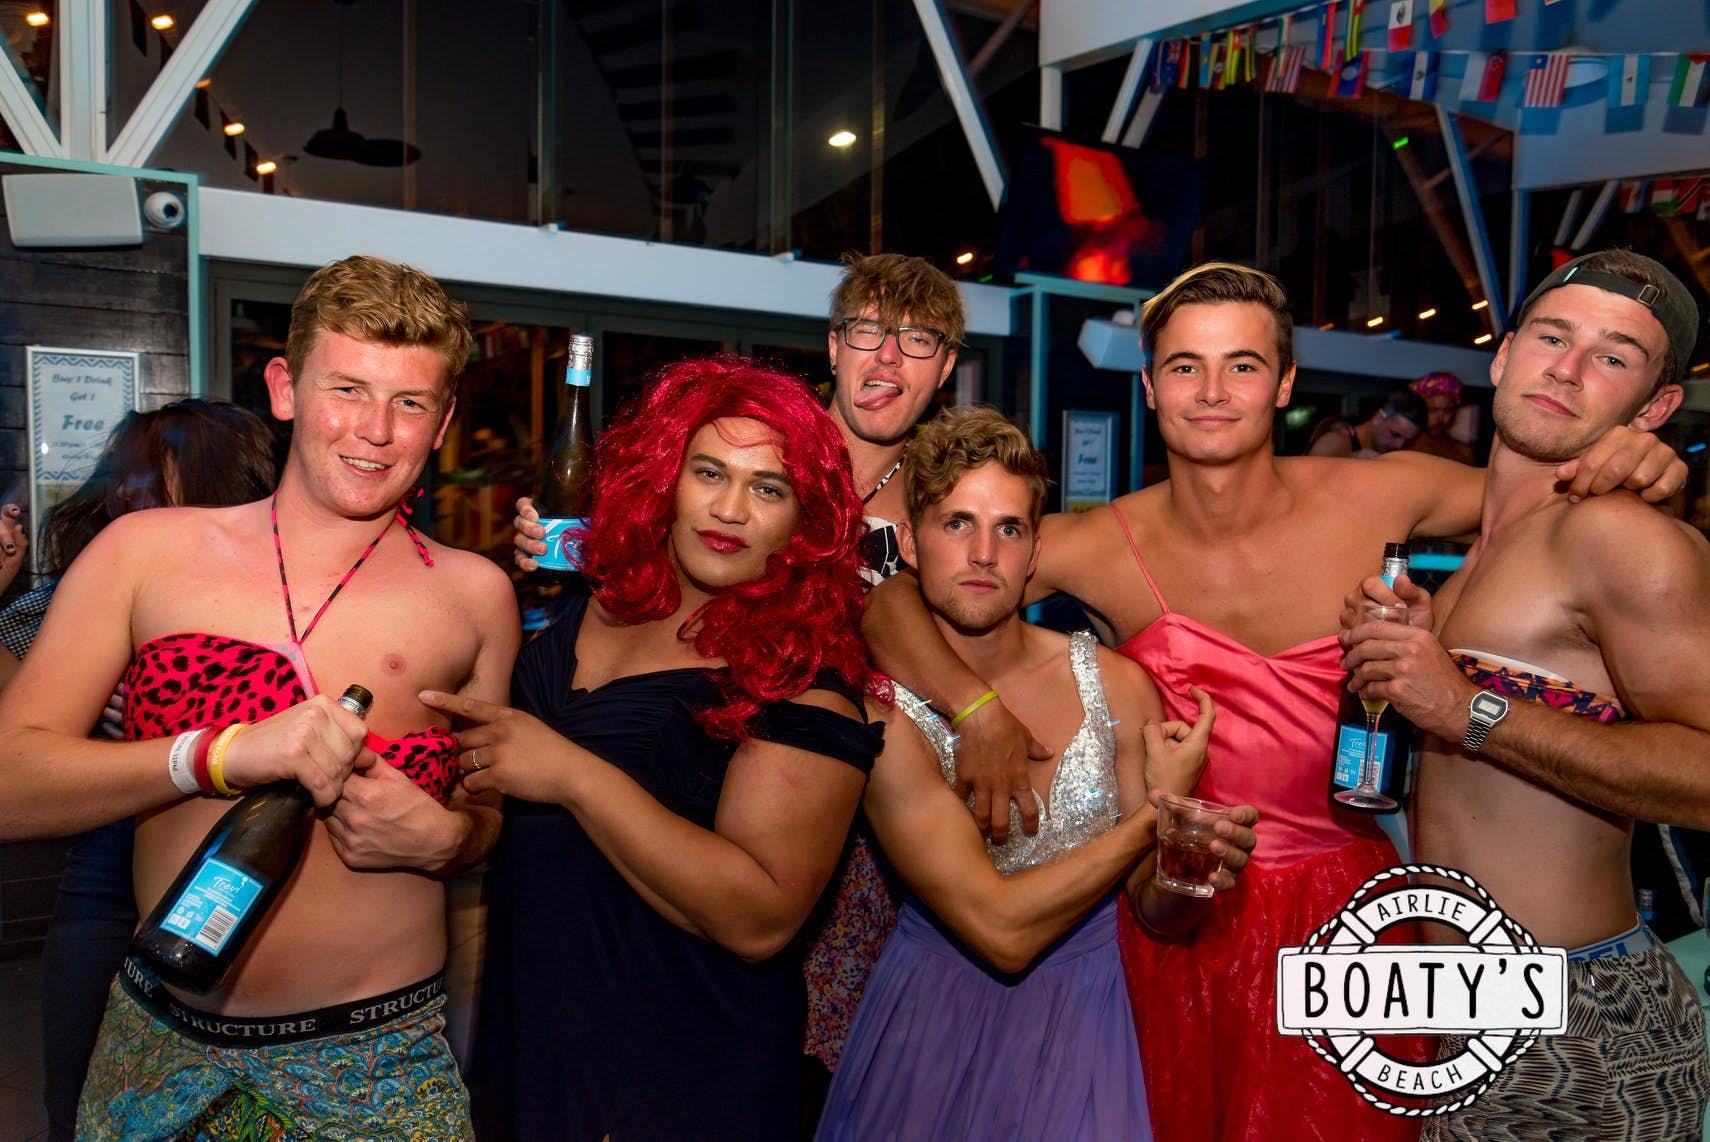 Base艾尔利海滩背包客旅馆的Ladyboy Comp